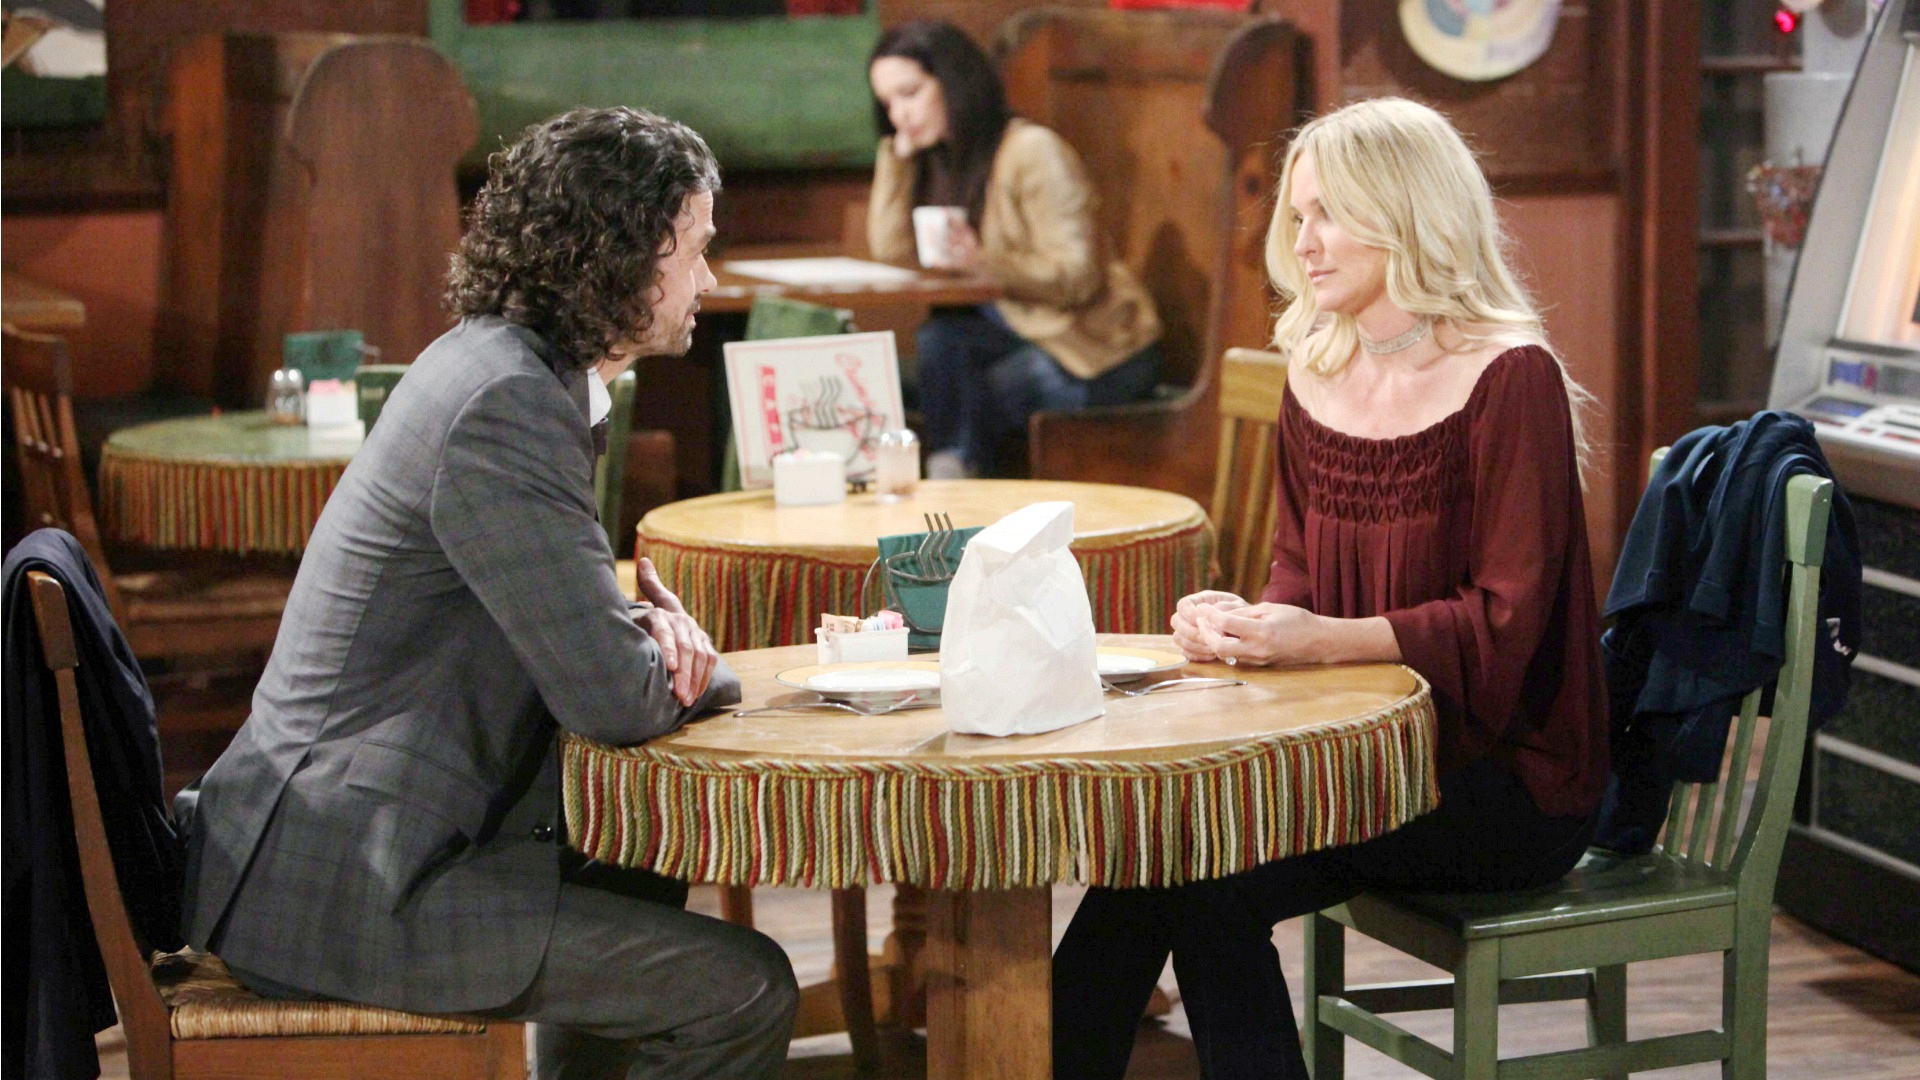 Sharon bonds with Scott.